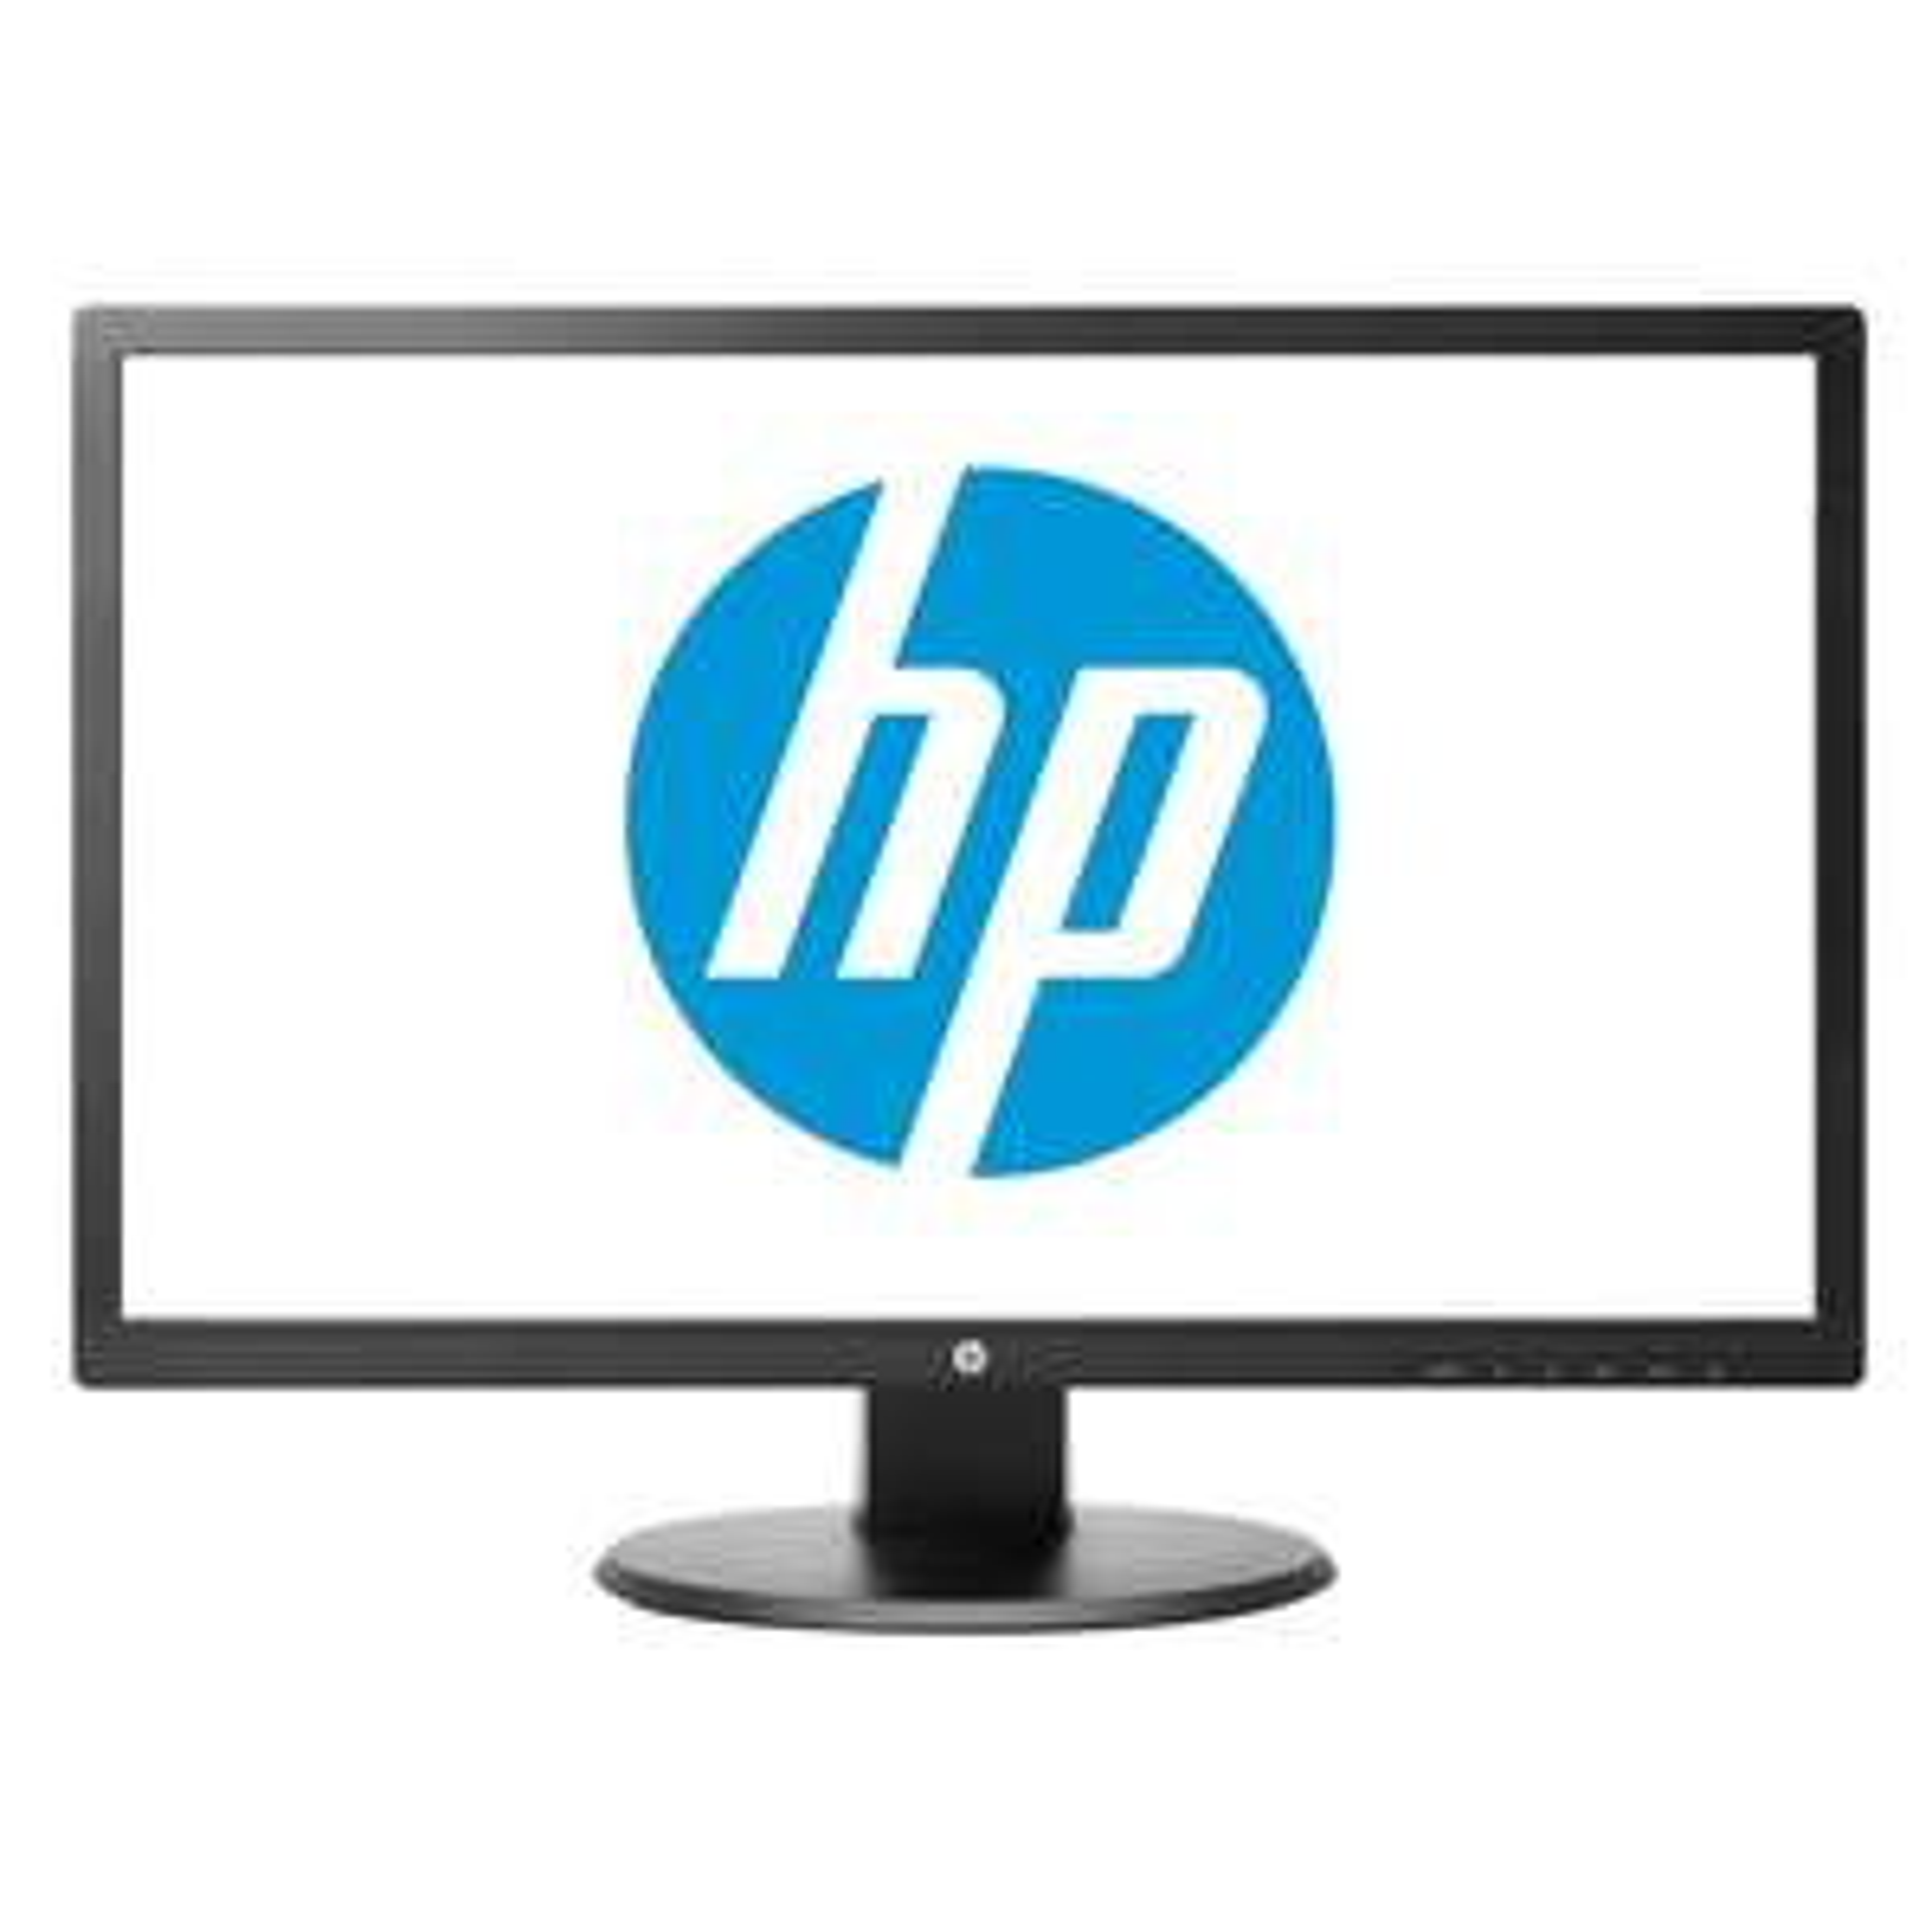 "HP 24OH: 24"" Full HD LED TFT, 2 ms, HDMI,DVI,VGA (TN-Panel) für 90,53€ @NBB.de"